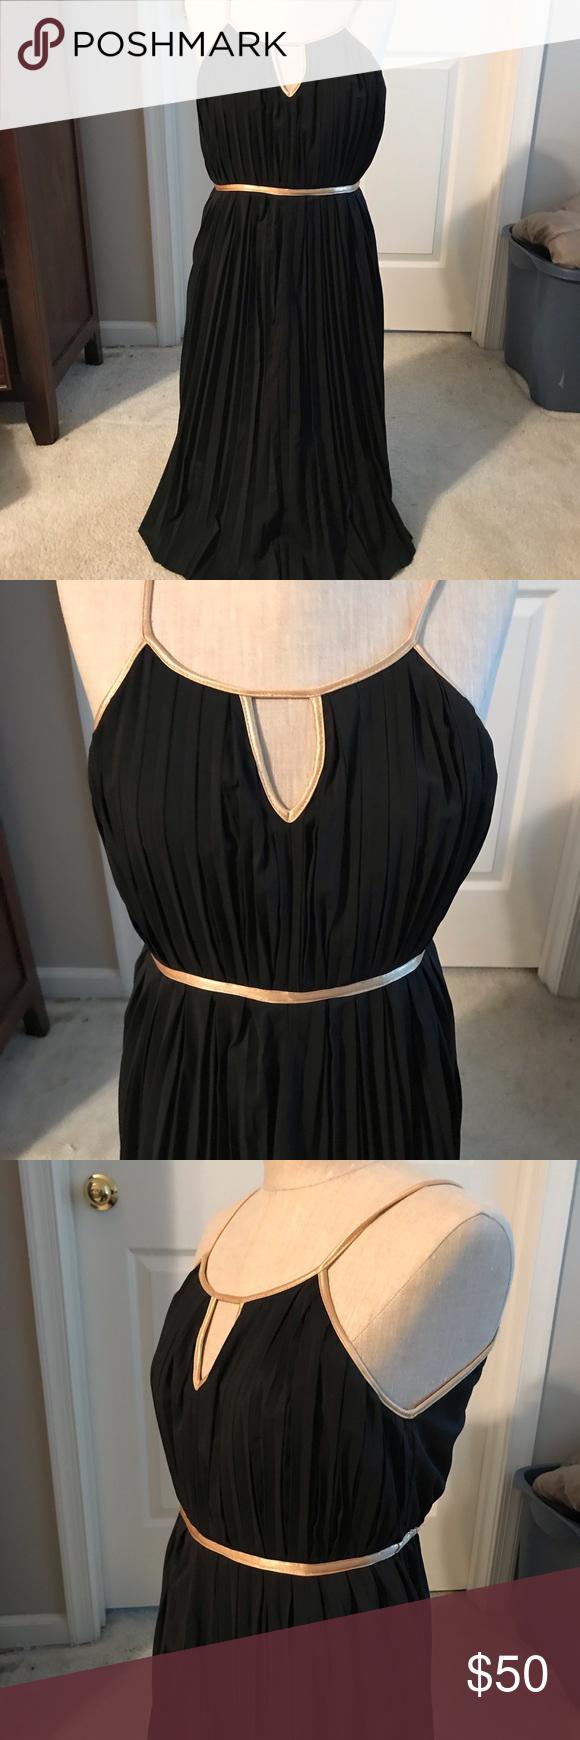 Grecian Style Accordion Pleat Black Dress W Gold Grecian Style Dress With Empire Waist And Accordion Pleats Gold Accent Black Pleated Dress Umgee Dress Style [ 1740 x 580 Pixel ]